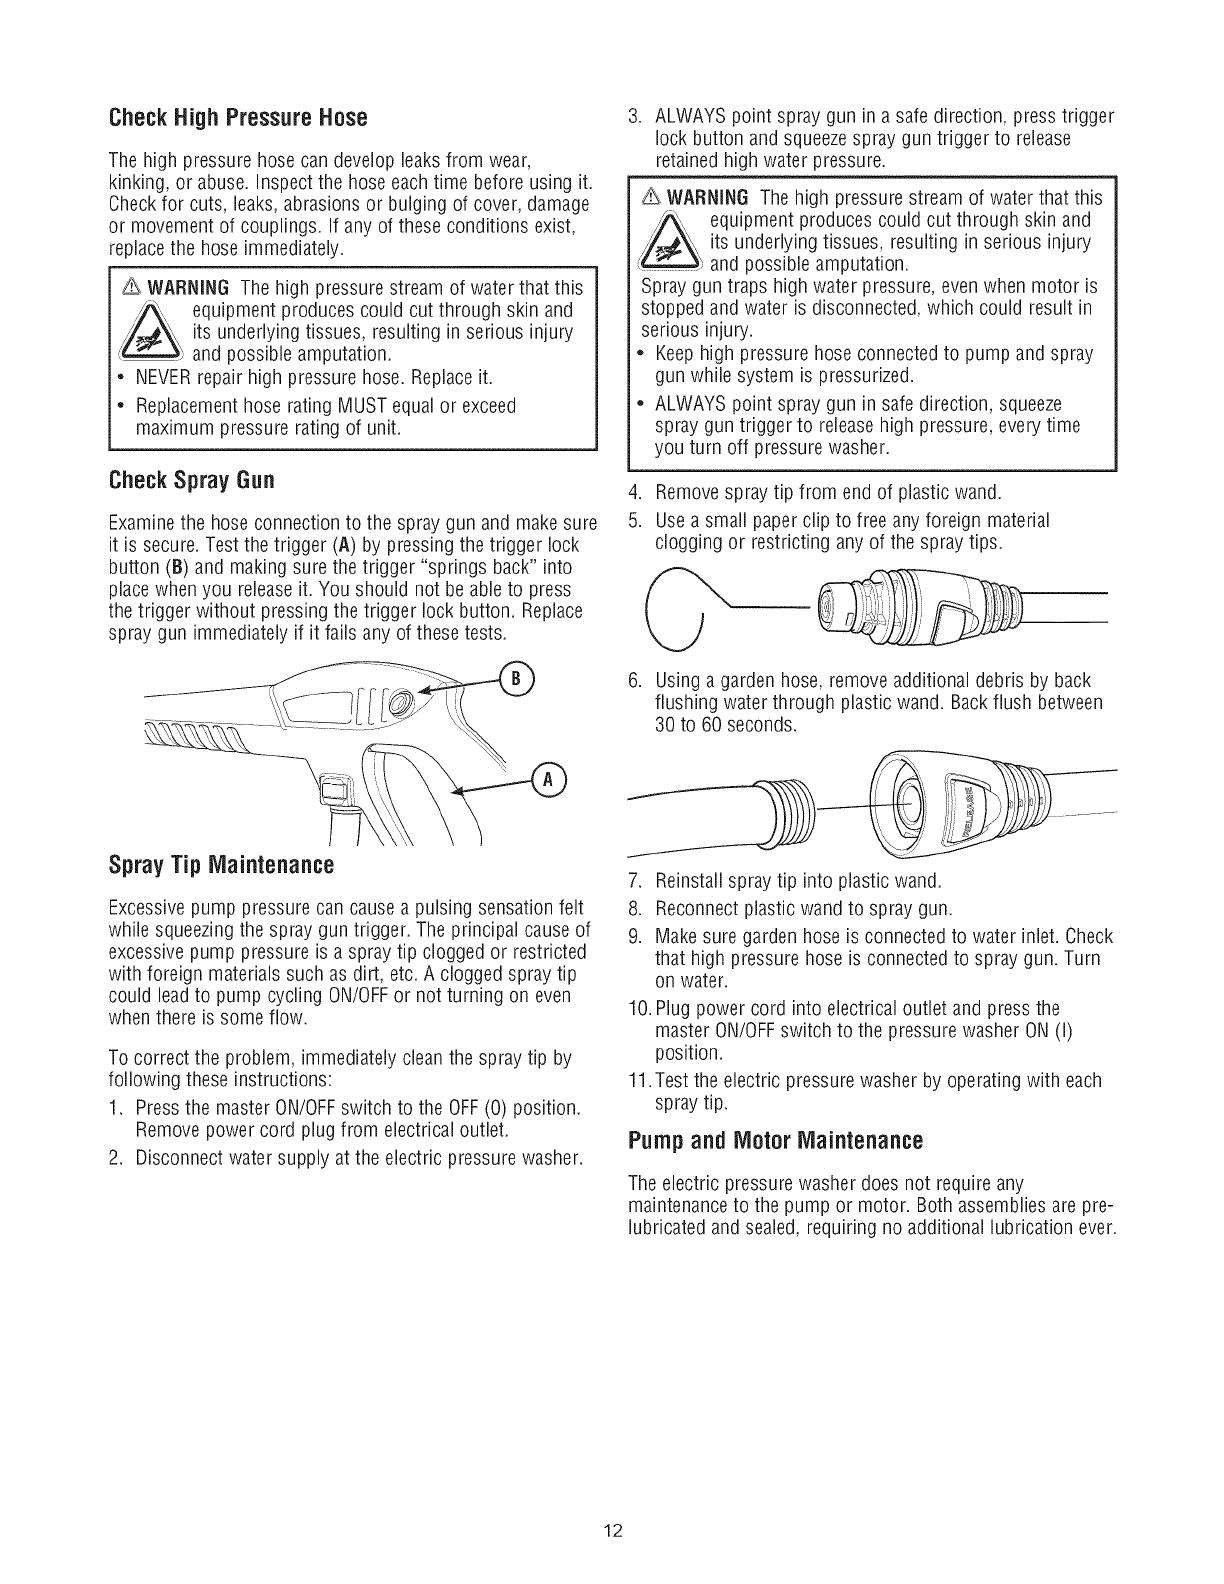 Craftsman 580750290 User Manual ELECTRIC POWER WASHER